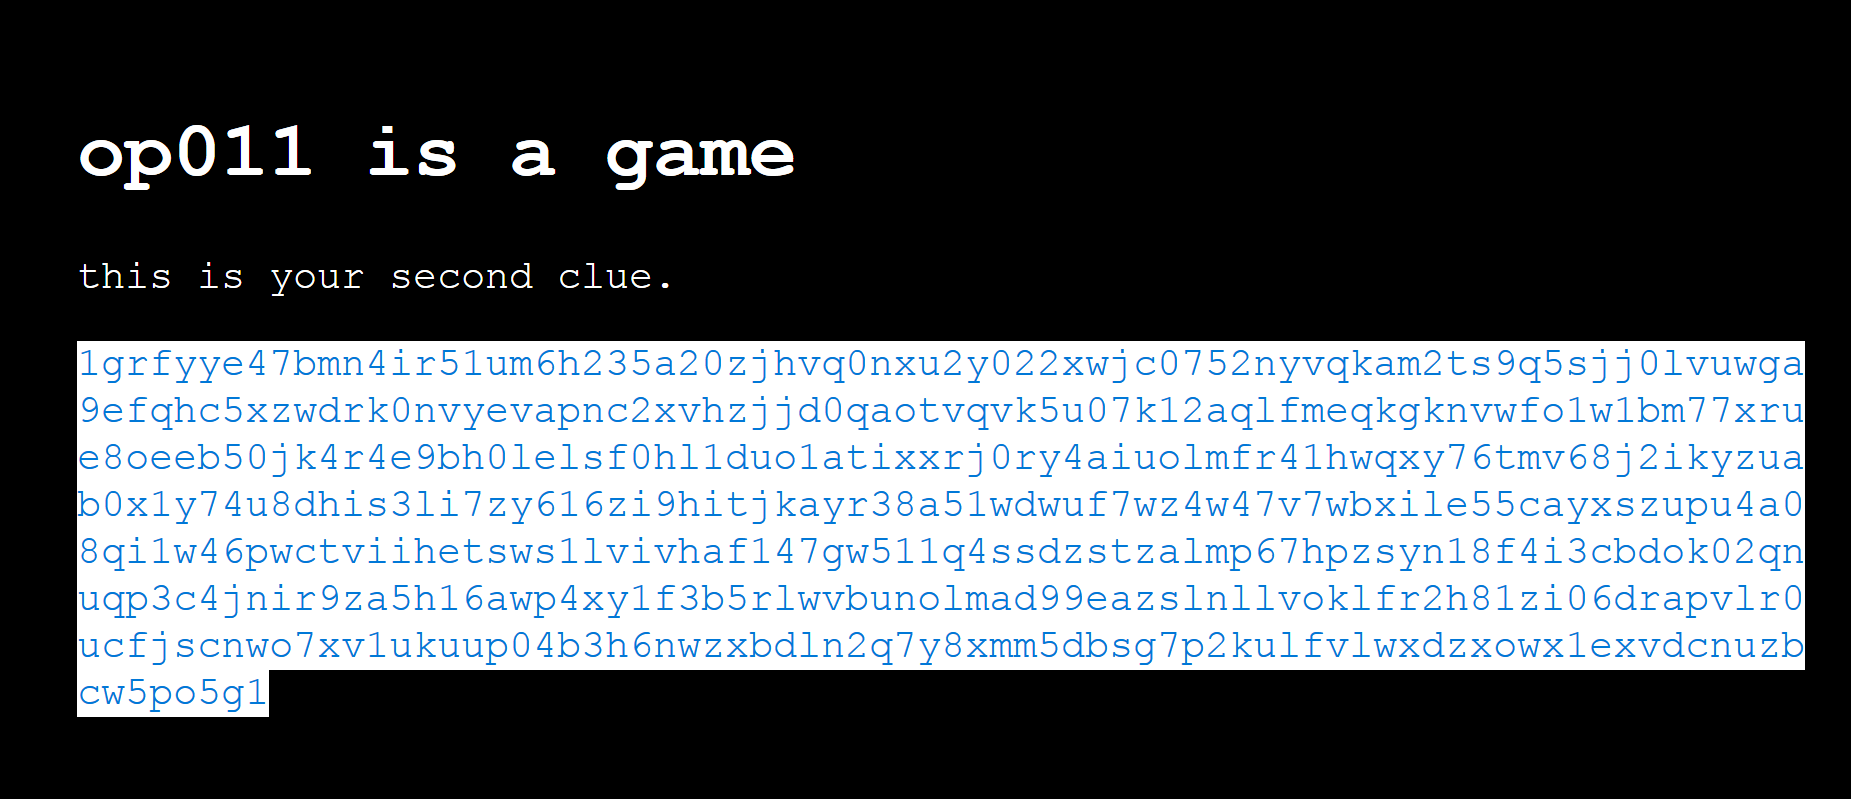 op011-second-clue